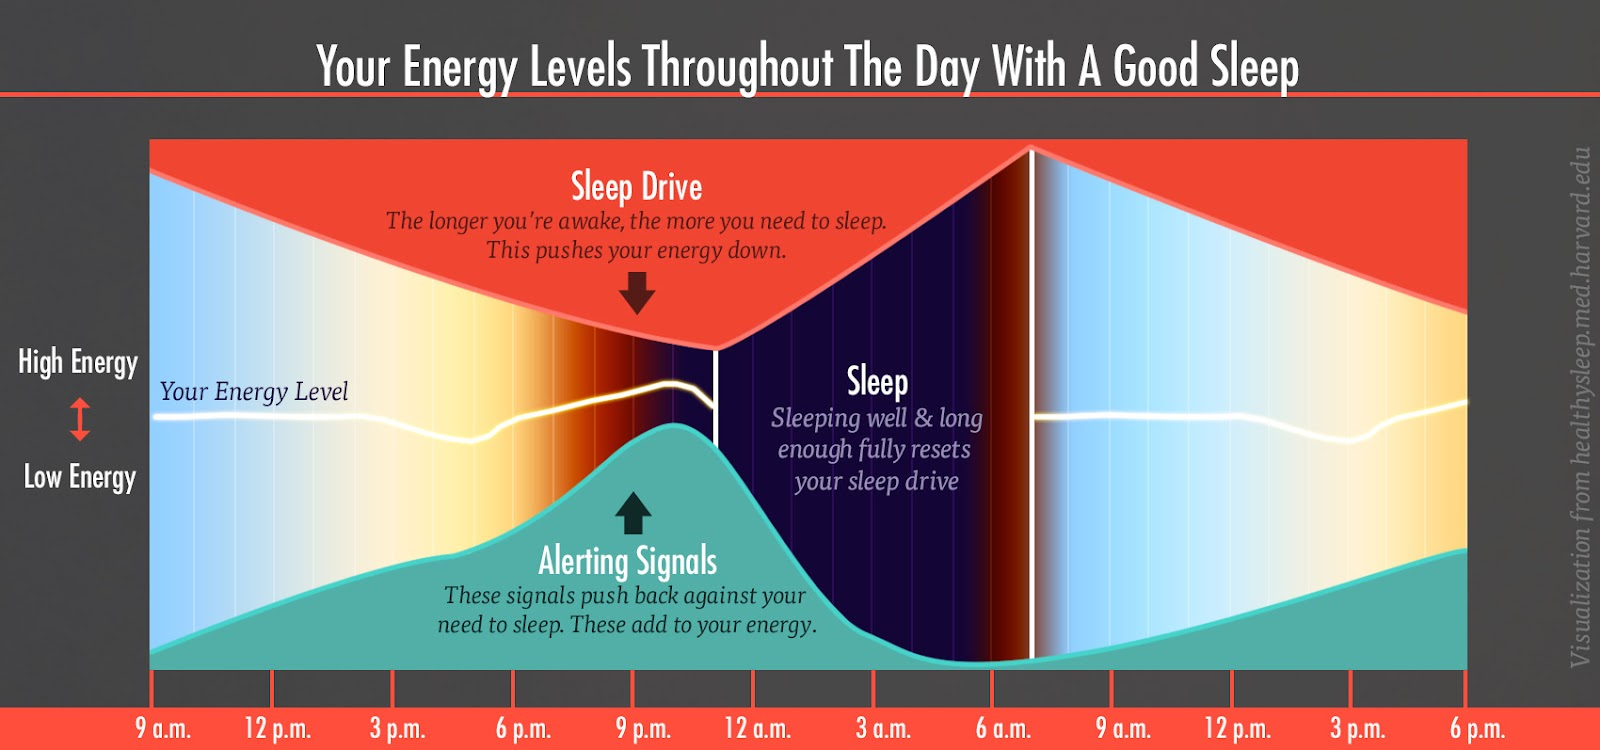 http://bonytobombshell.com/wp-content/uploads/2015/05/energy-levels-sleep-drive-alert-chart-1-bony-bombshell.jpg